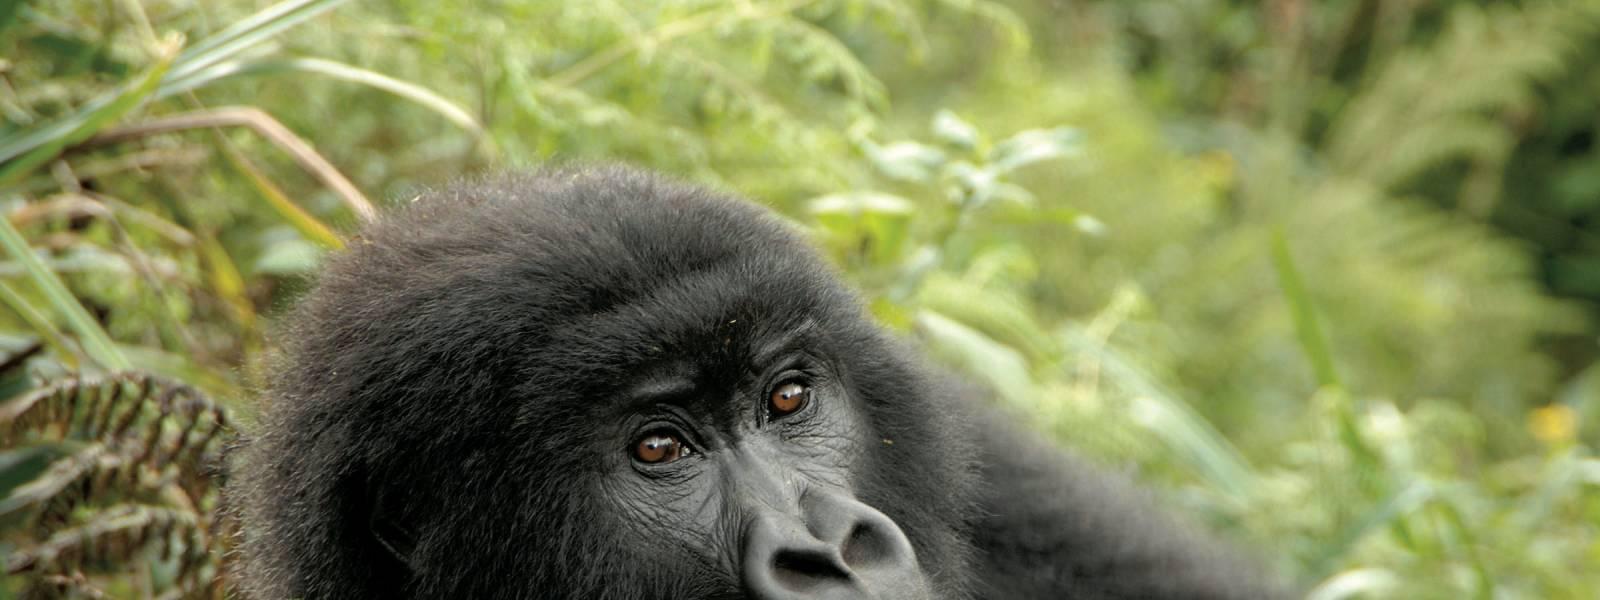 a black bear lying on some grass